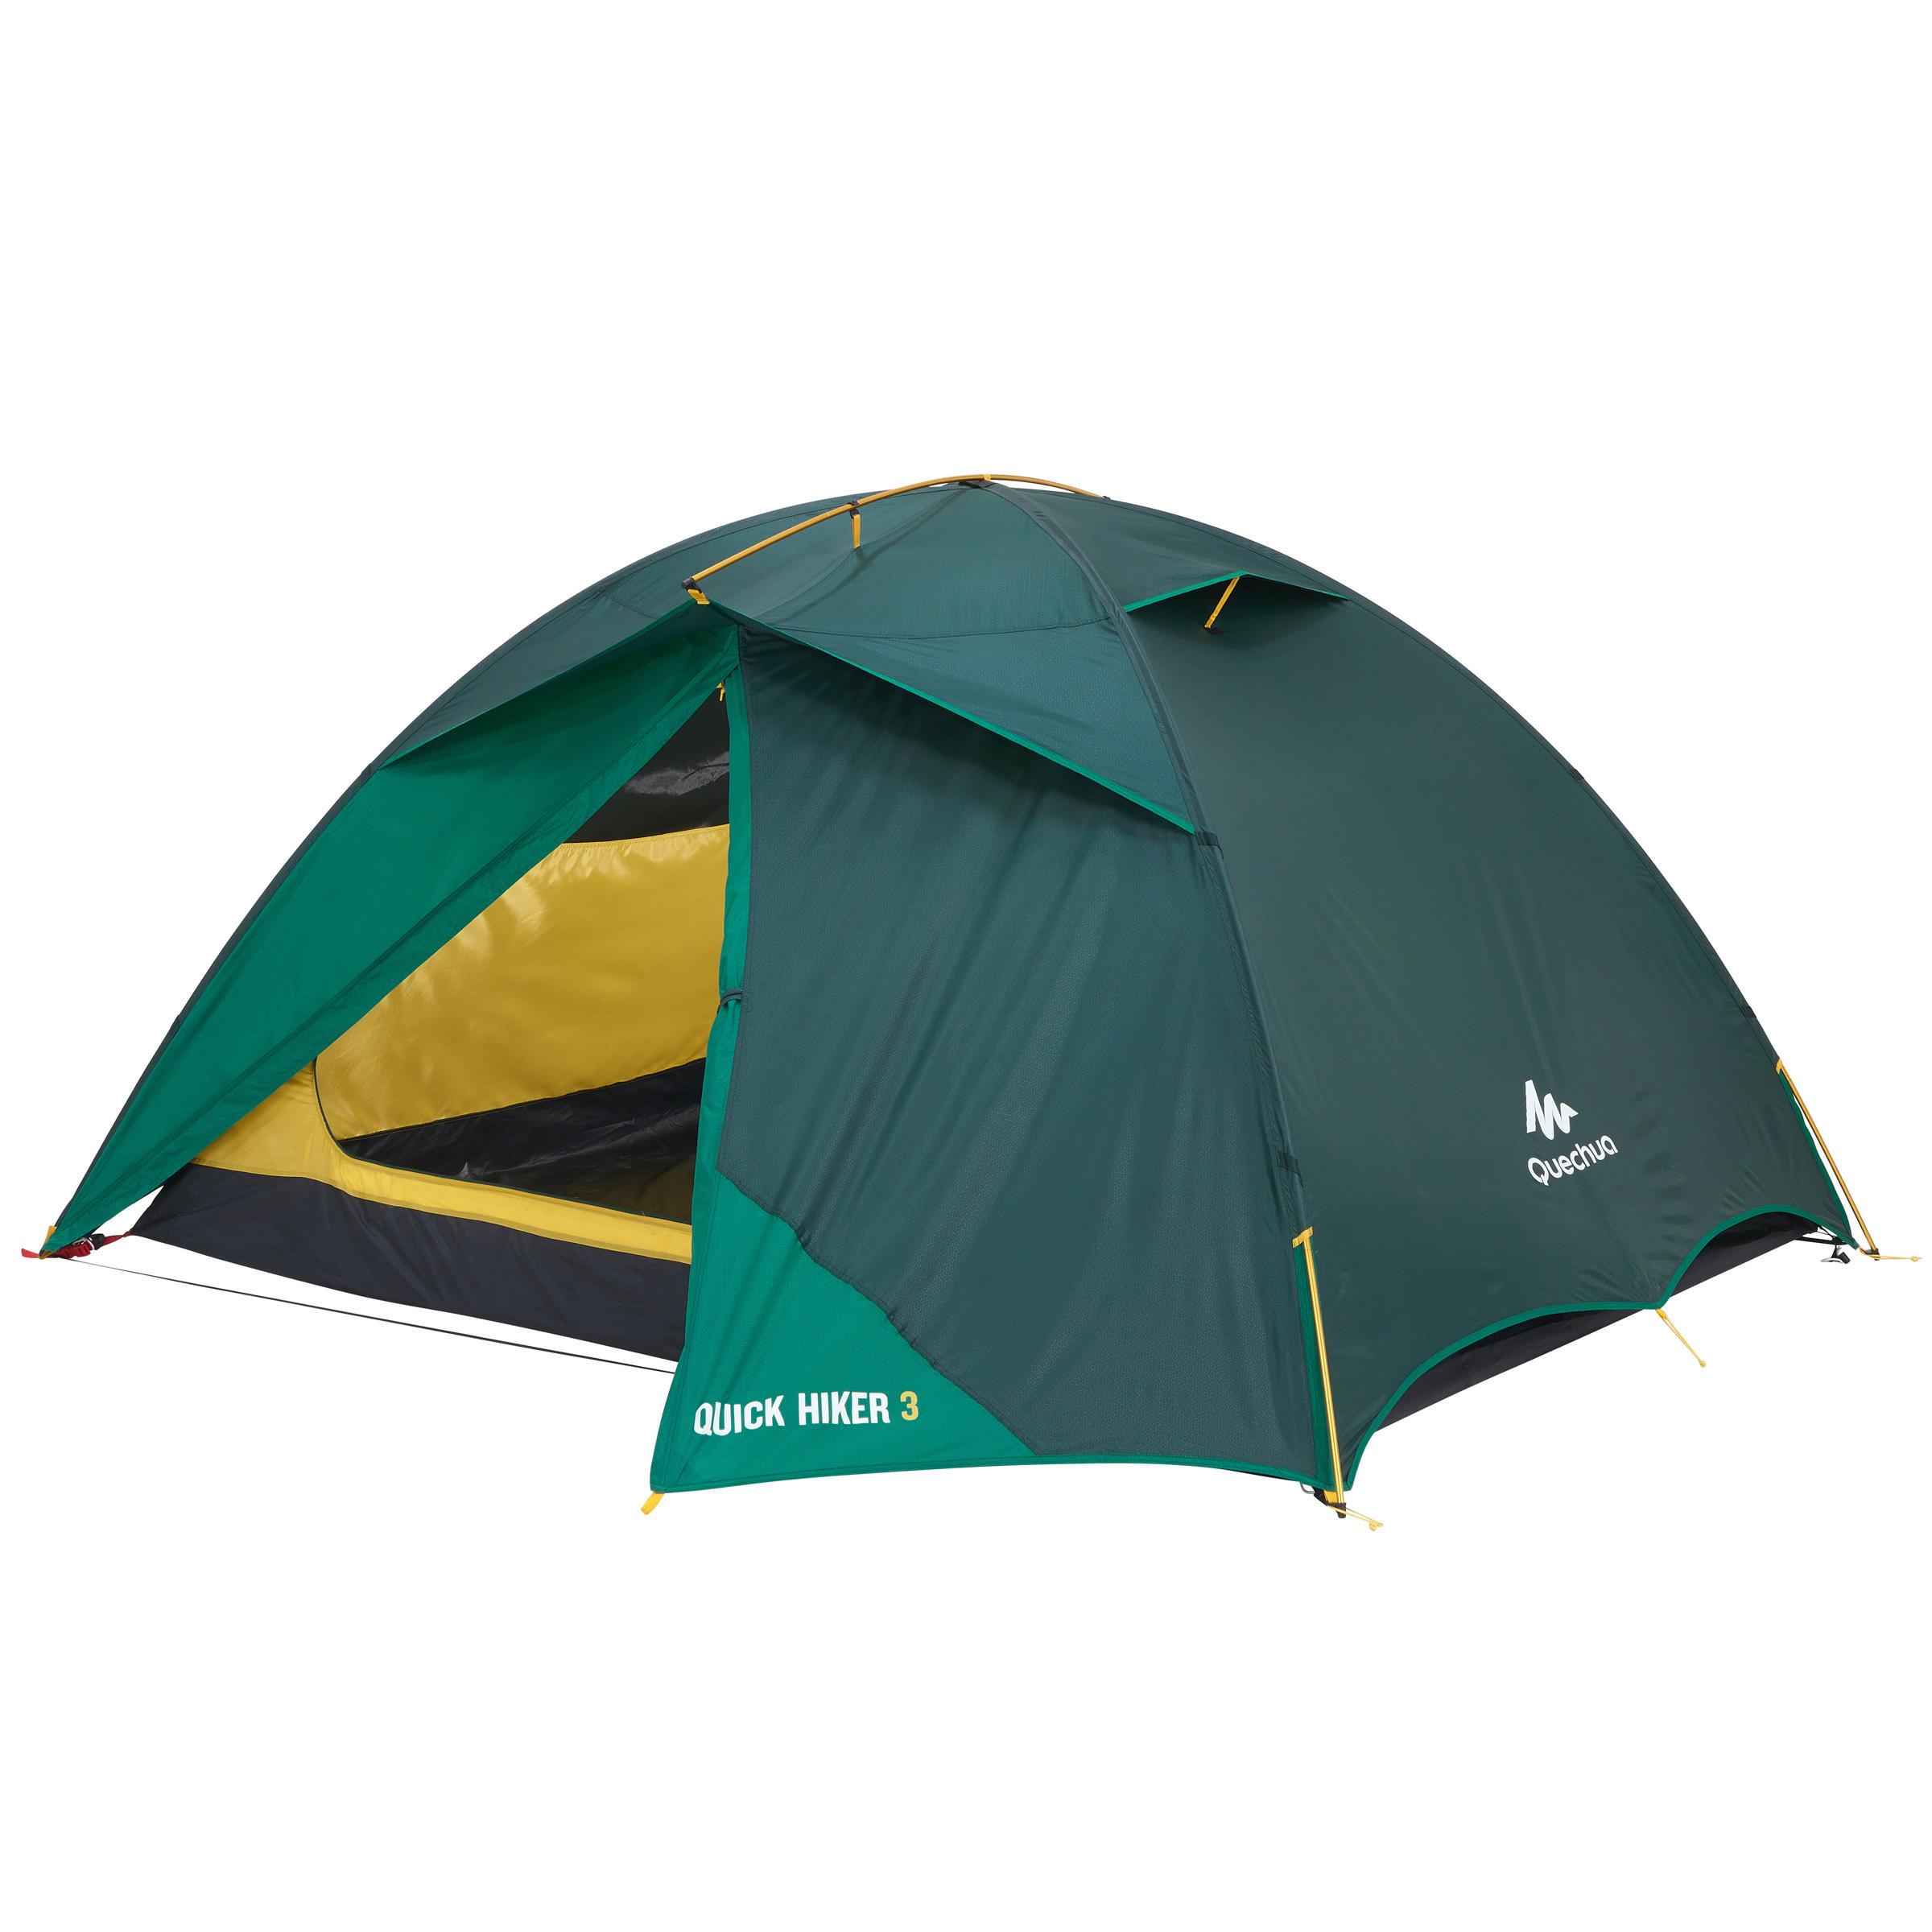 QuickHiker 3 person tent - green